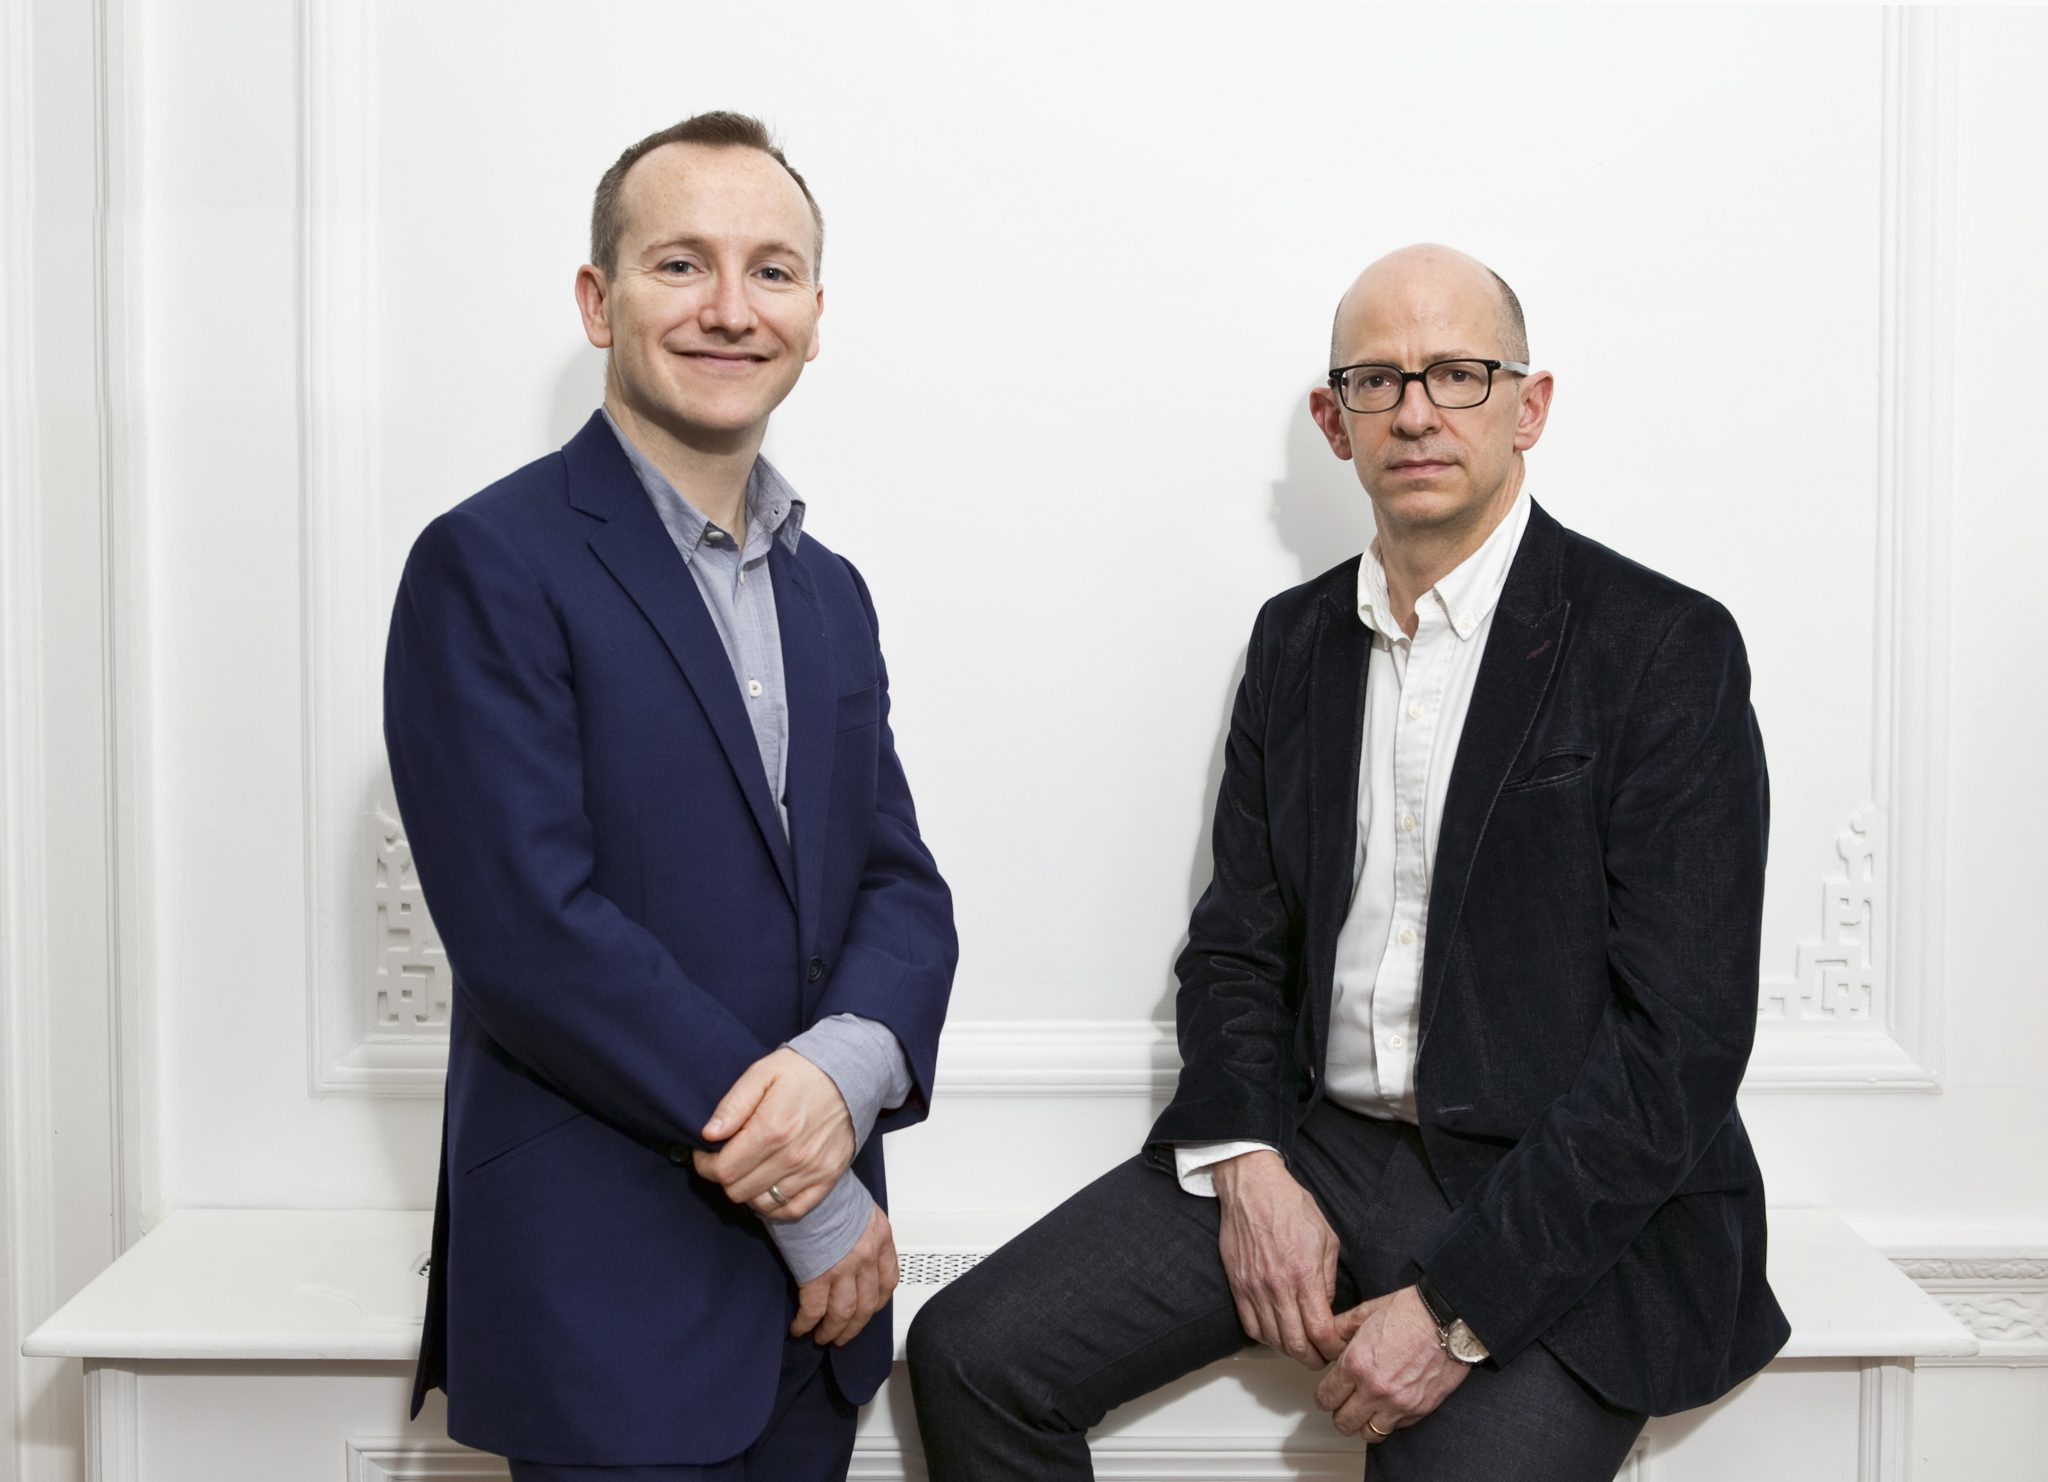 David Flynn and Lucas Church